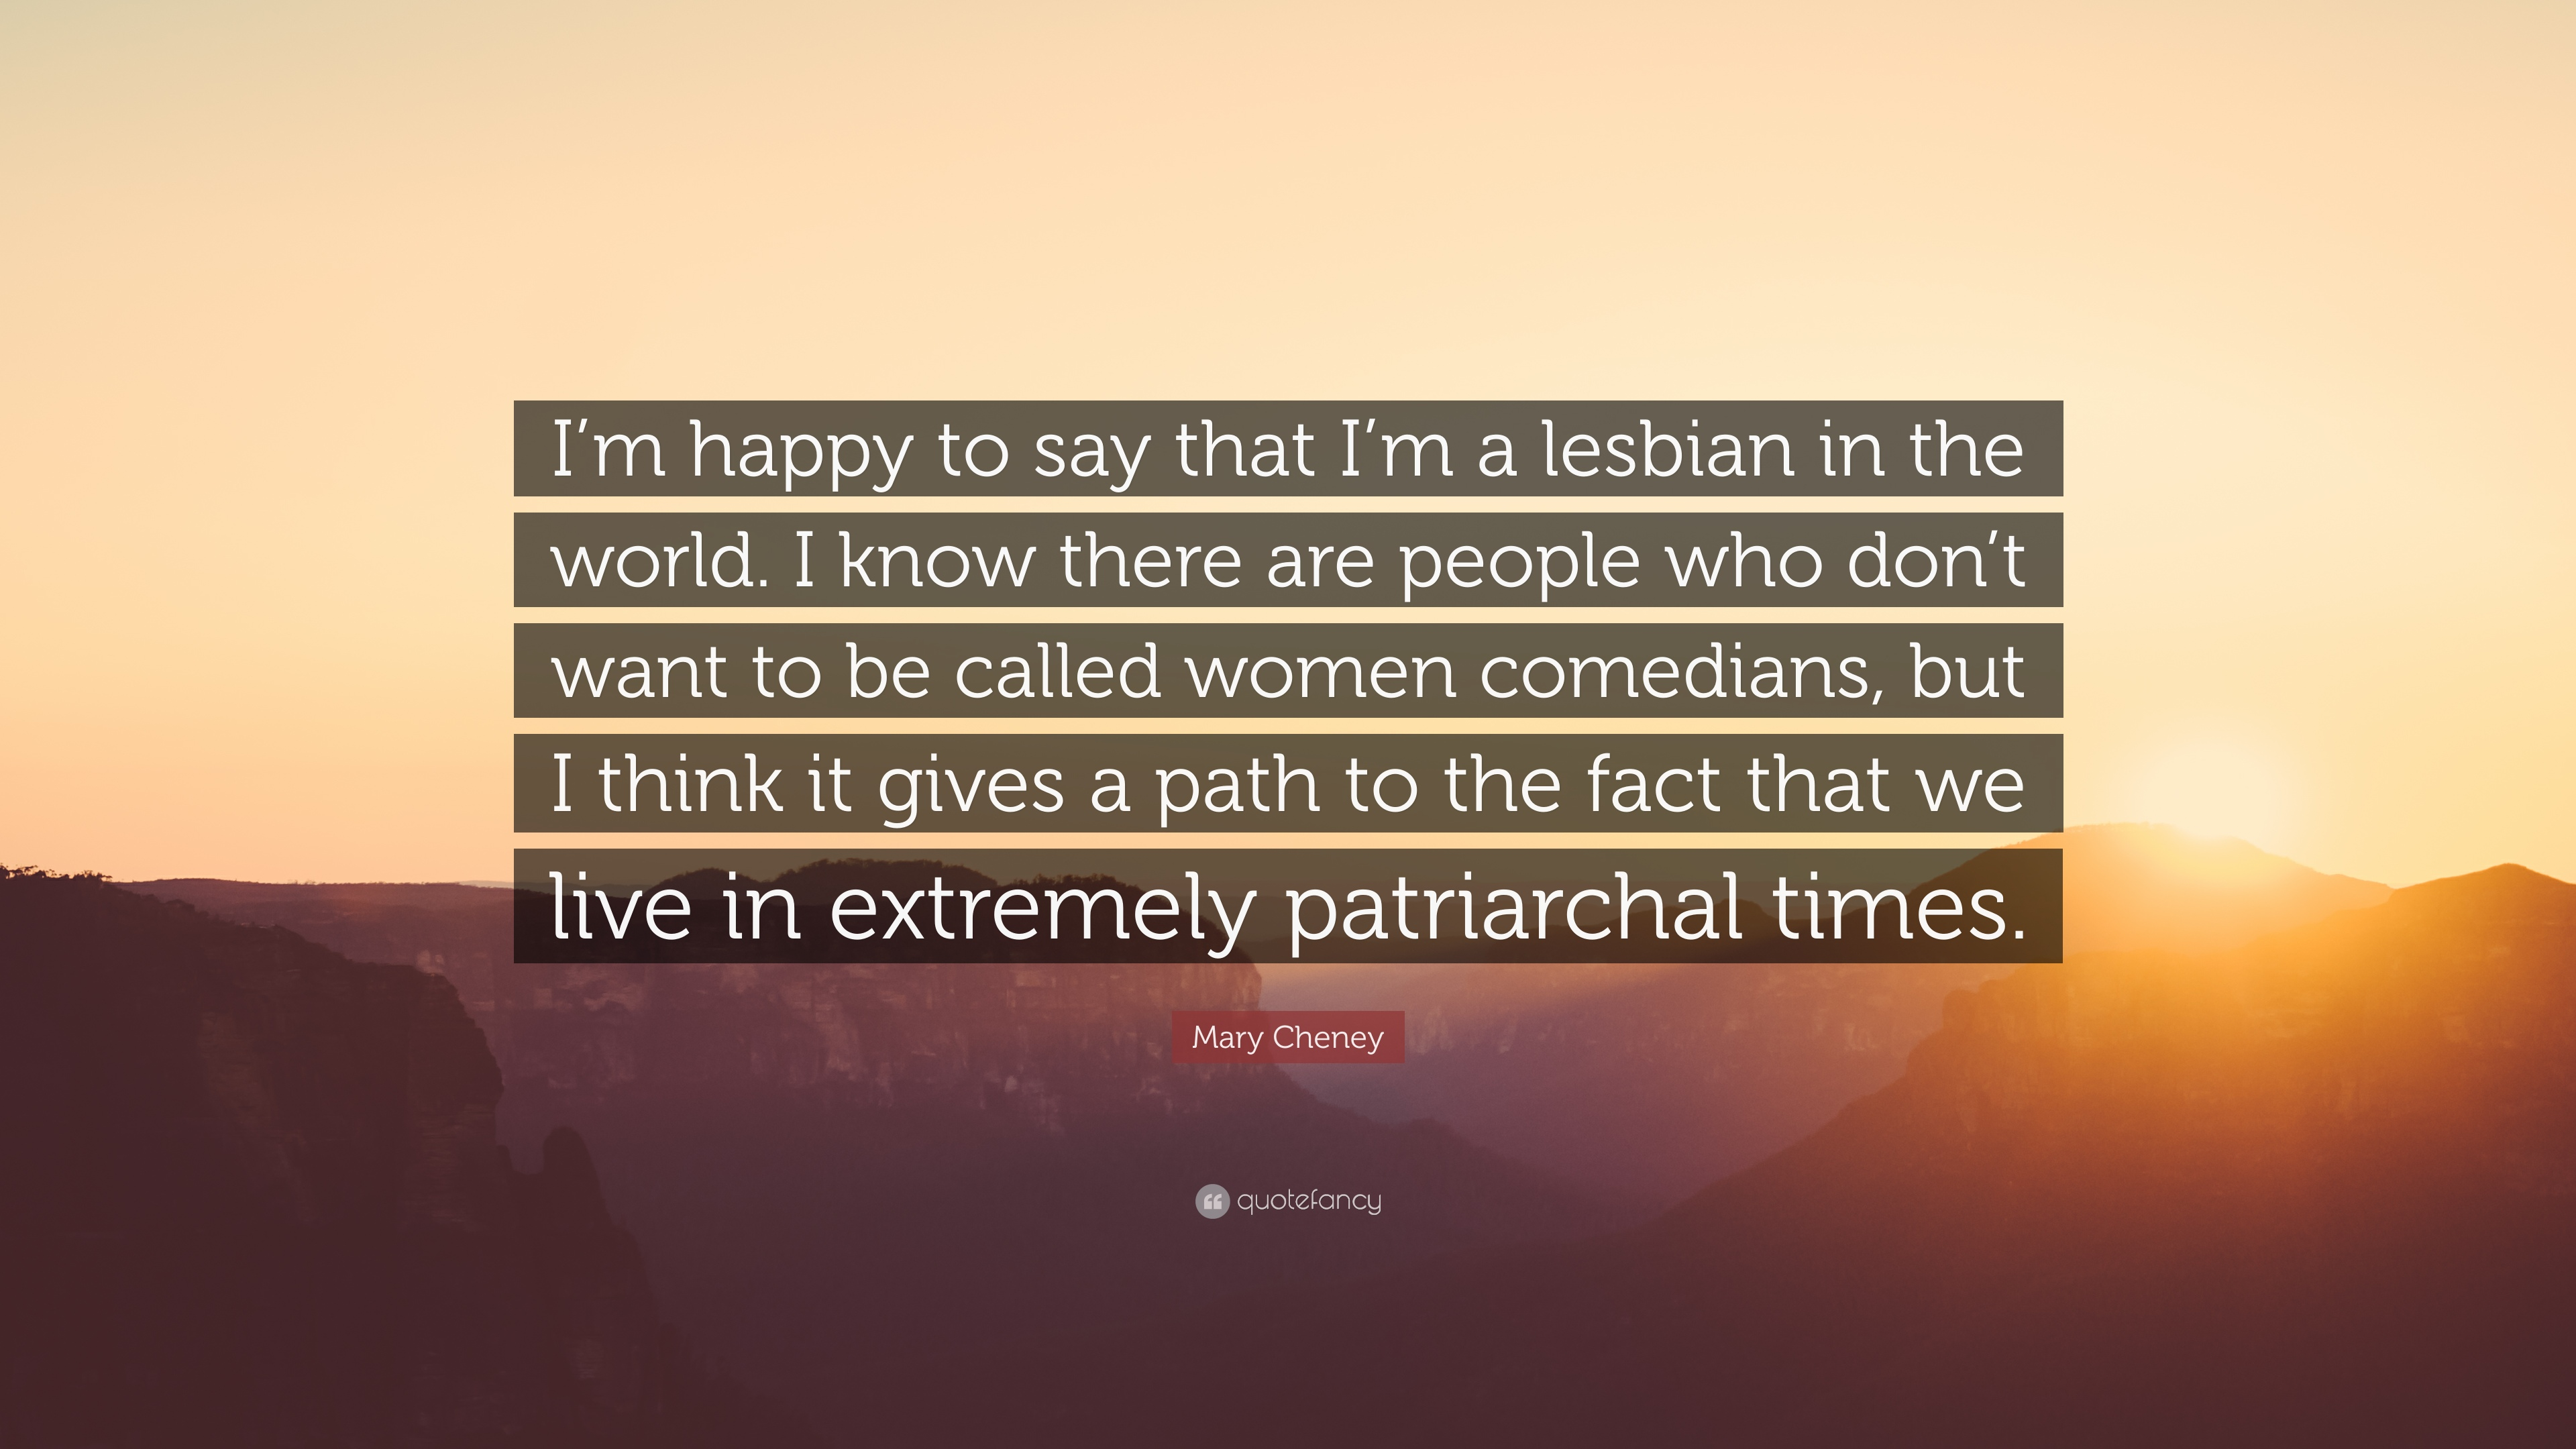 lesbian world quotes